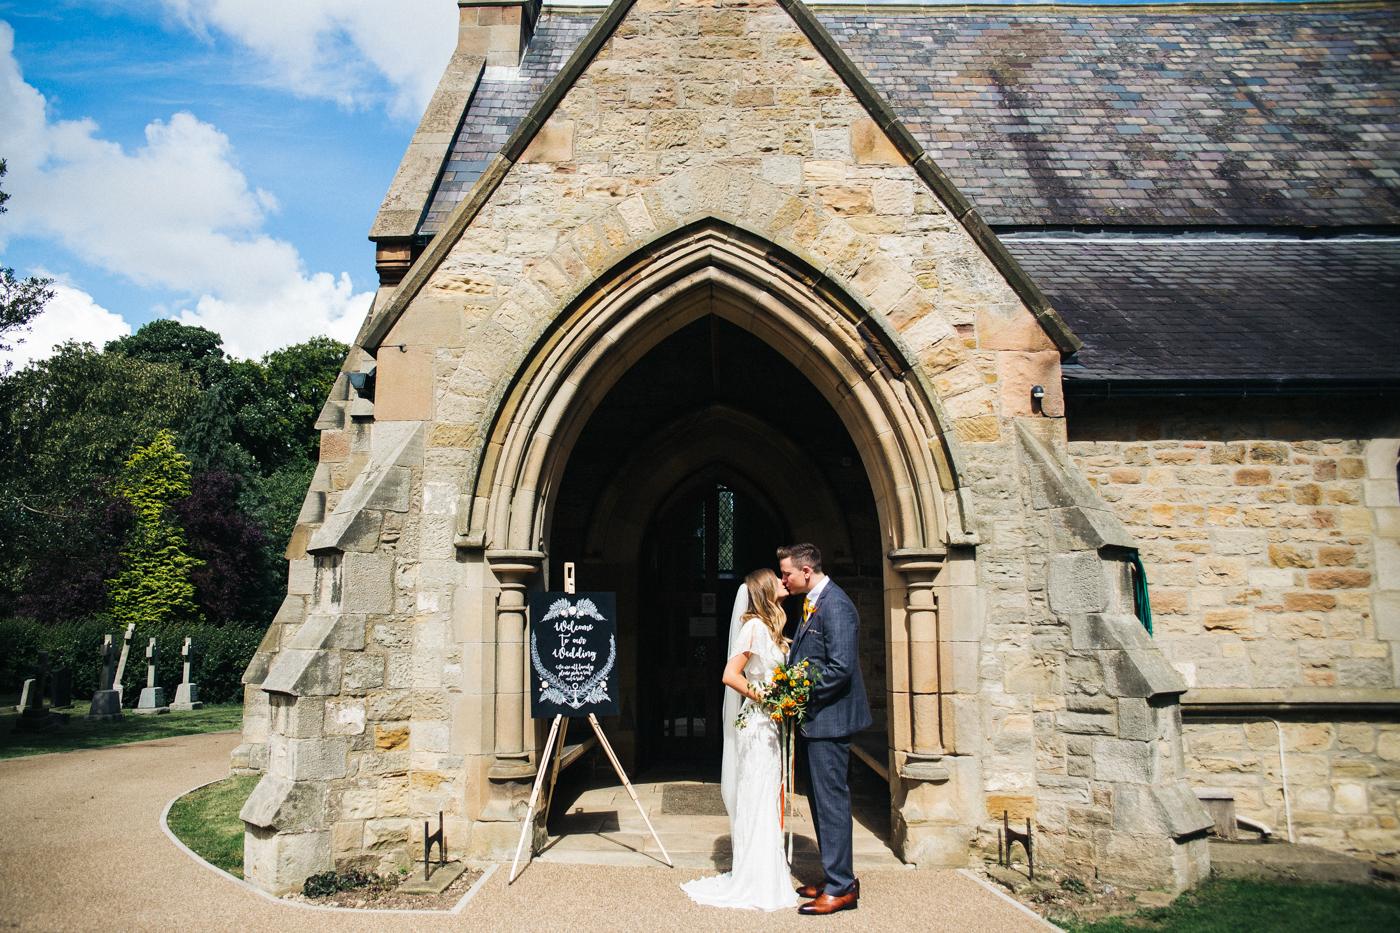 teesside-middlesbrough-north-east-wedding-photographer-creative-wedding-venues-0154.jpg